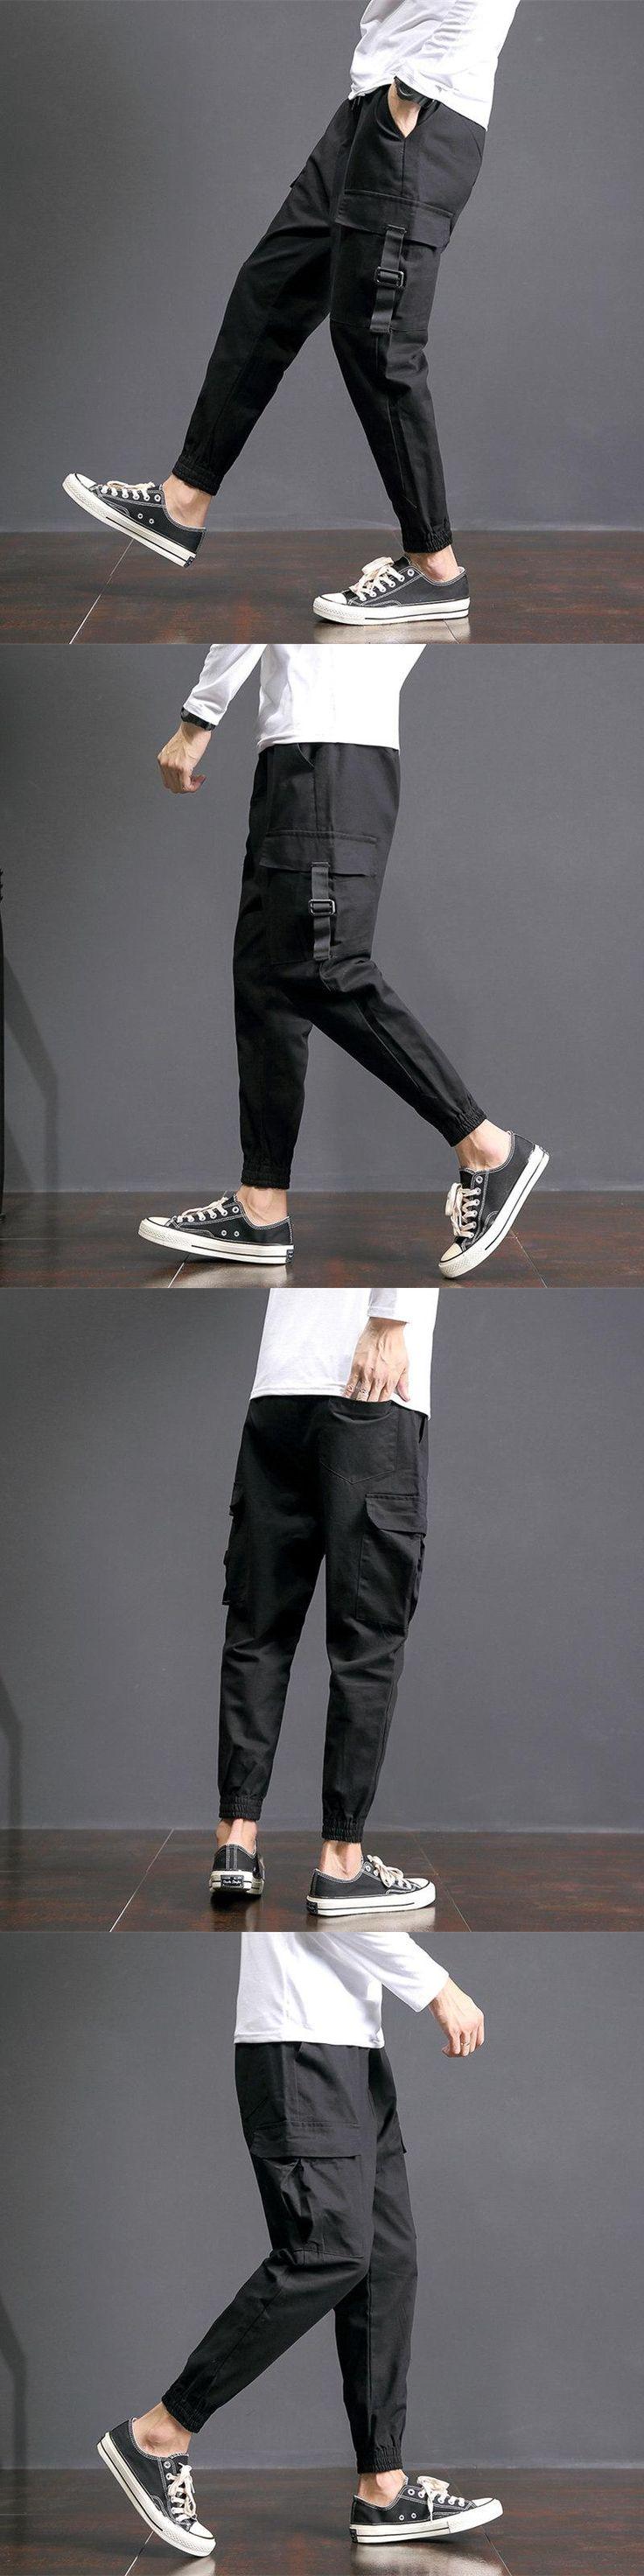 2017 Autumn Japanese Pocket Leisure Mens Trousers Fashion Casual Pants Male Overalls Cotton Jacket Long Pantalon Hombre Chinos